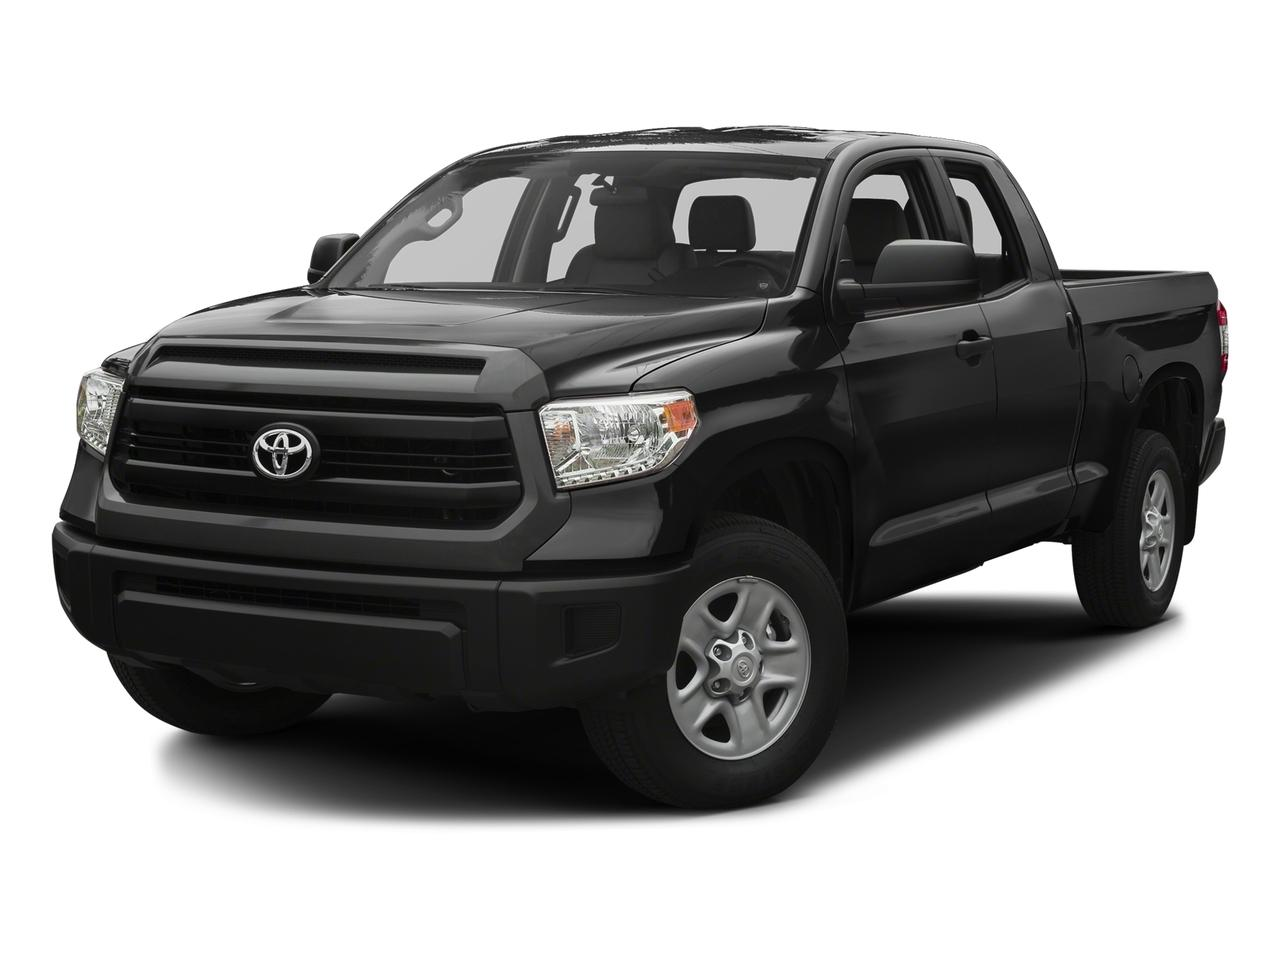 2017 Toyota Tundra 2WD Vehicle Photo in Killeen, TX 76541